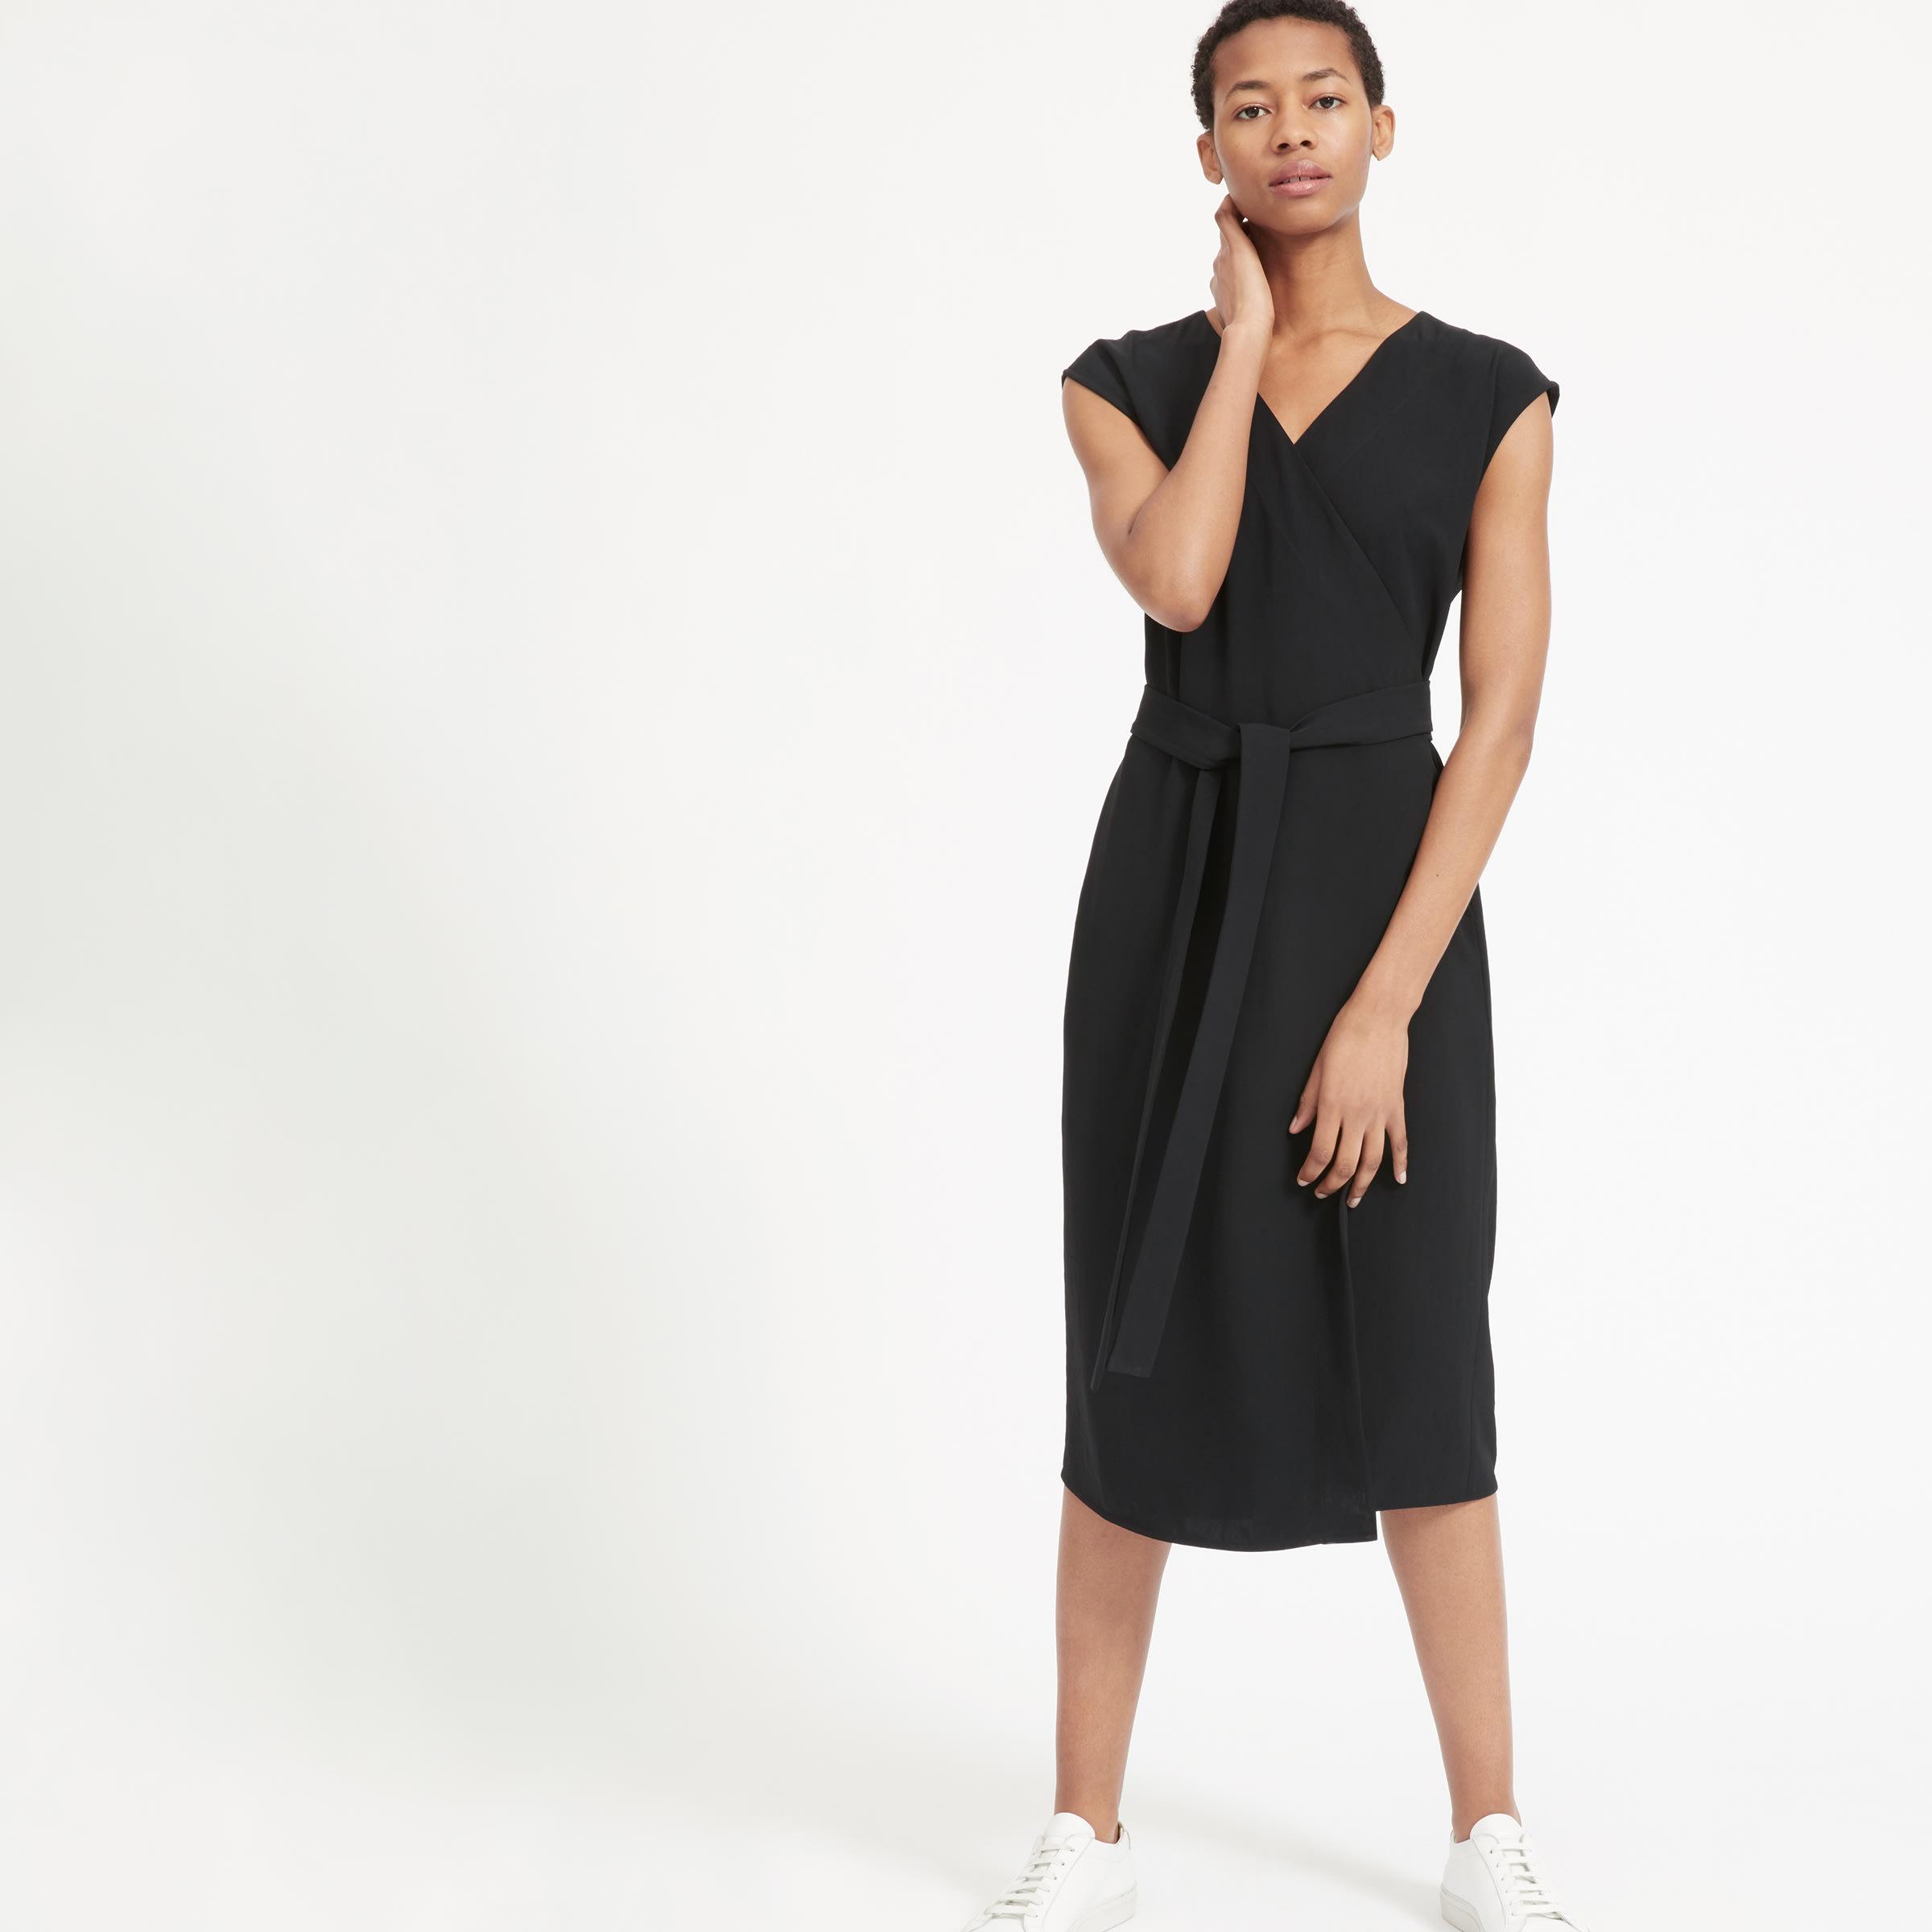 a2c99b85fc2 Women s Japanese GoWeave Short-Sleeve Wrap Dress